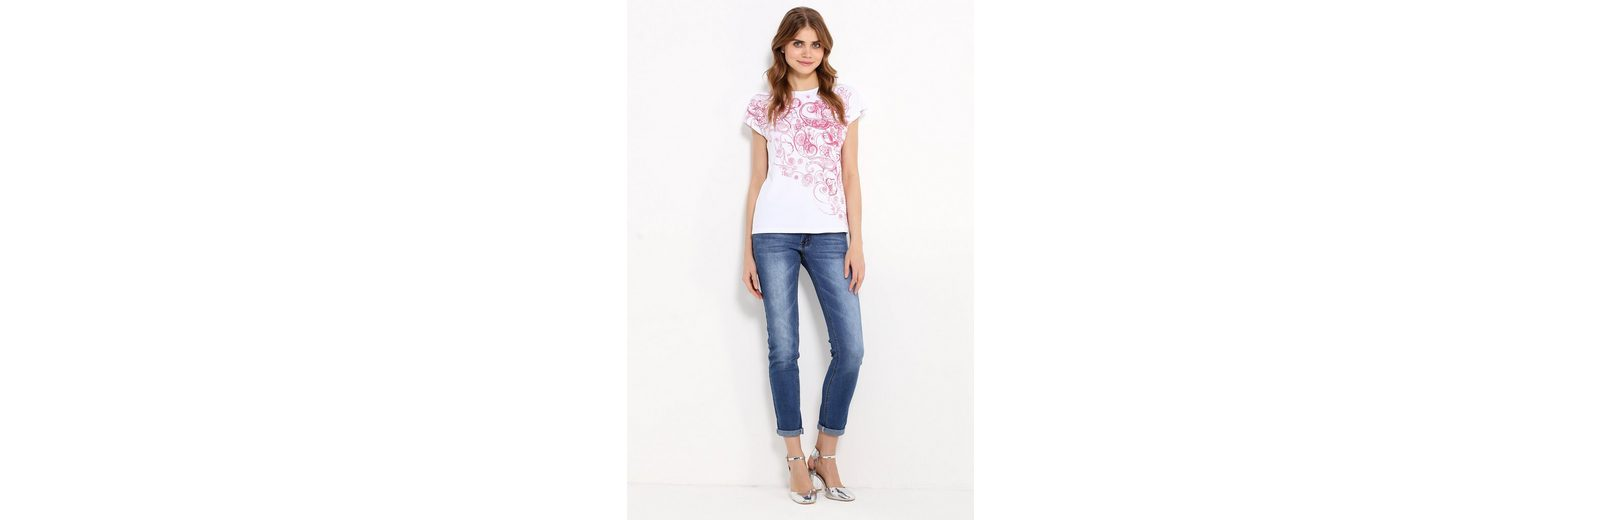 Flare Finn T T Flare modischem mit Finn Paisley Print Shirt rxxntfq